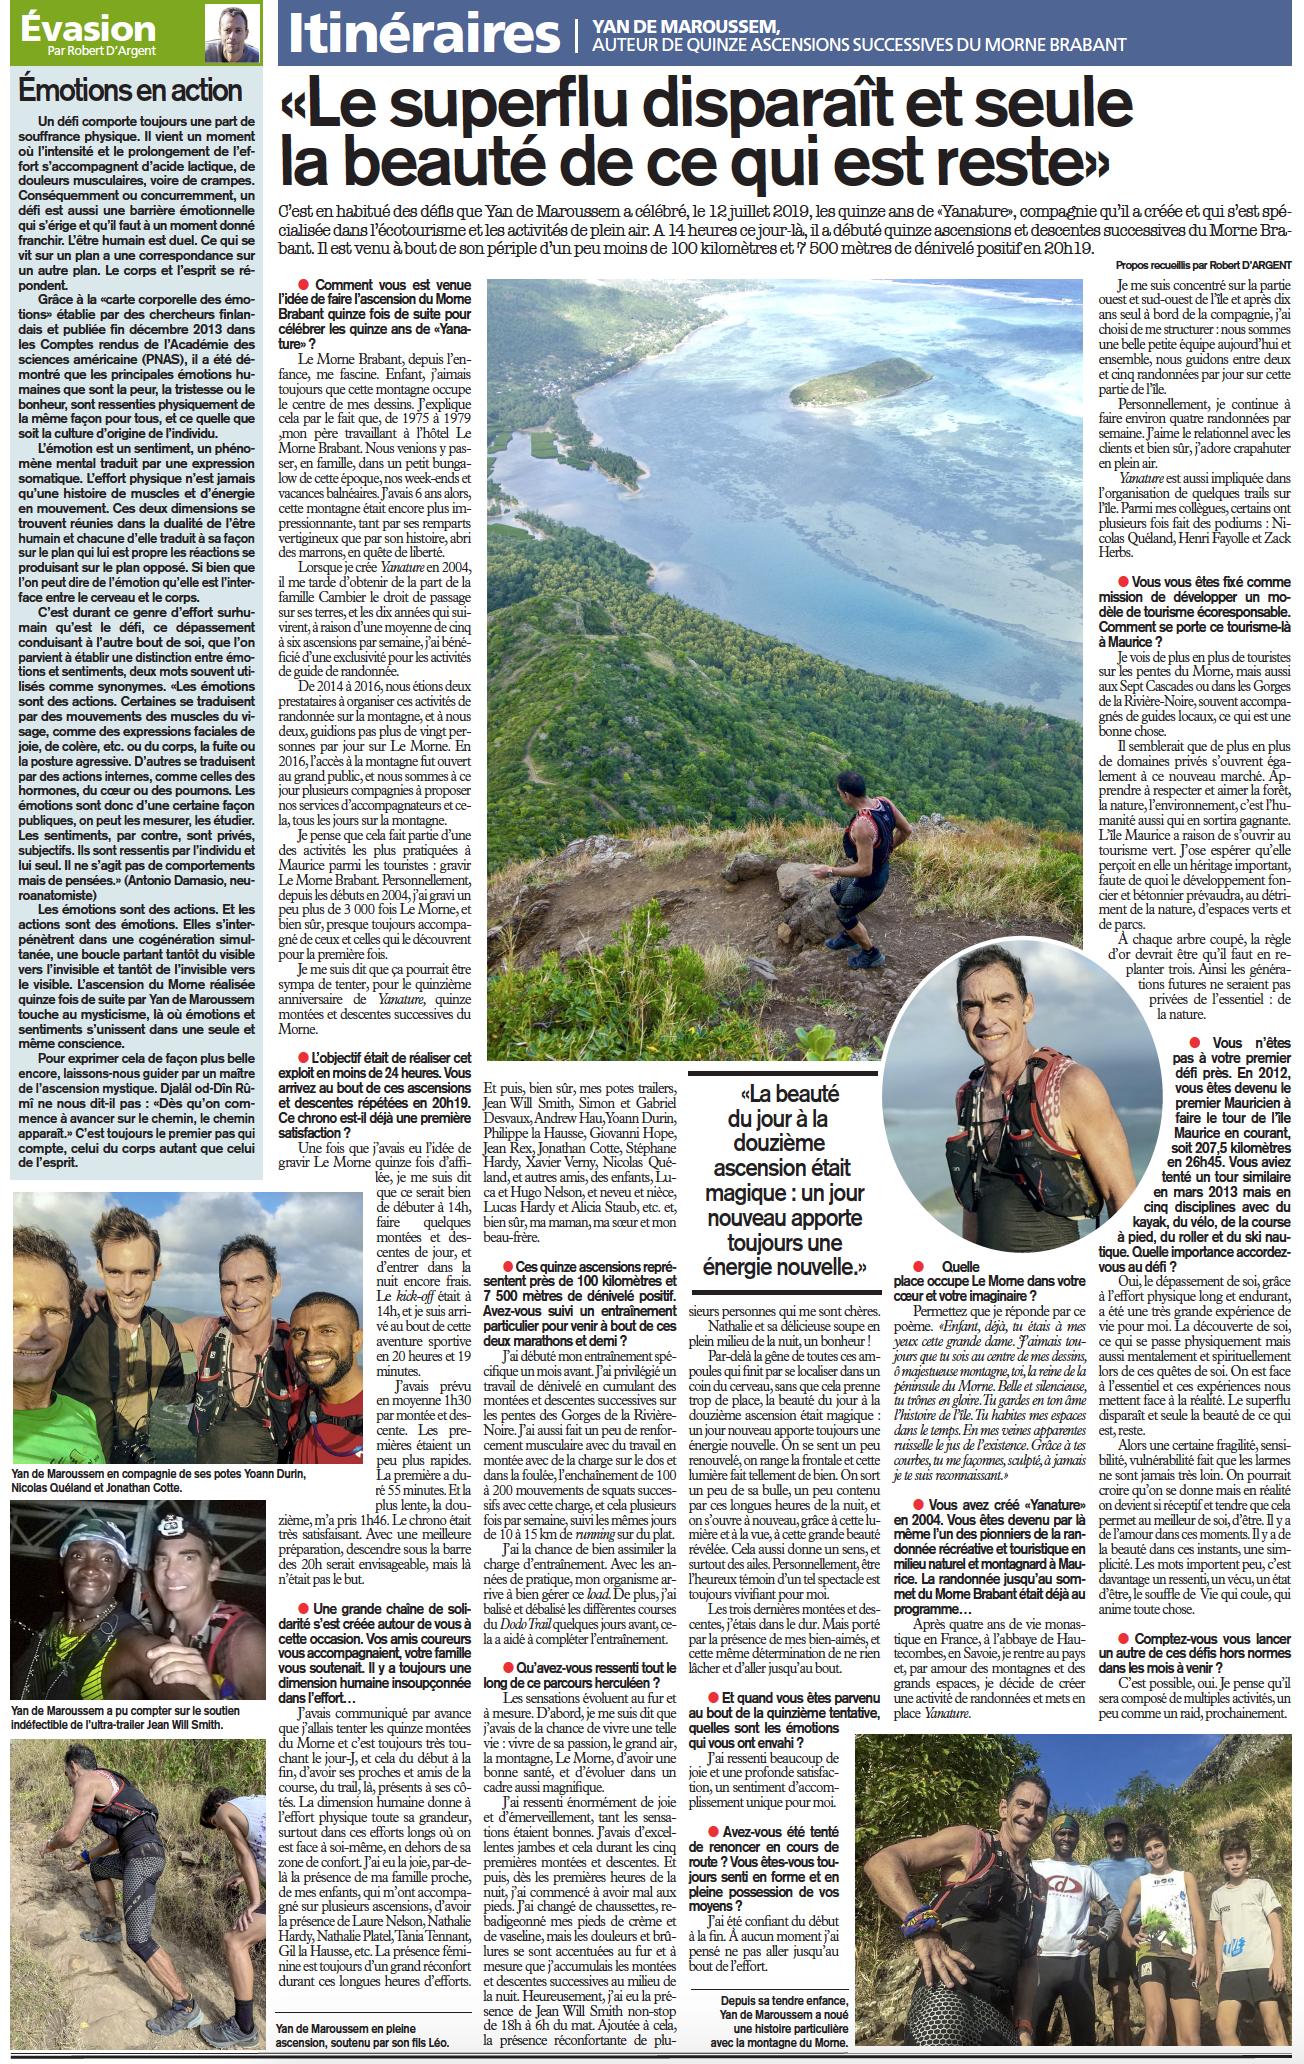 Interview From L'express about Yan de Maroussem 15 ascents of Le Morne Brabant